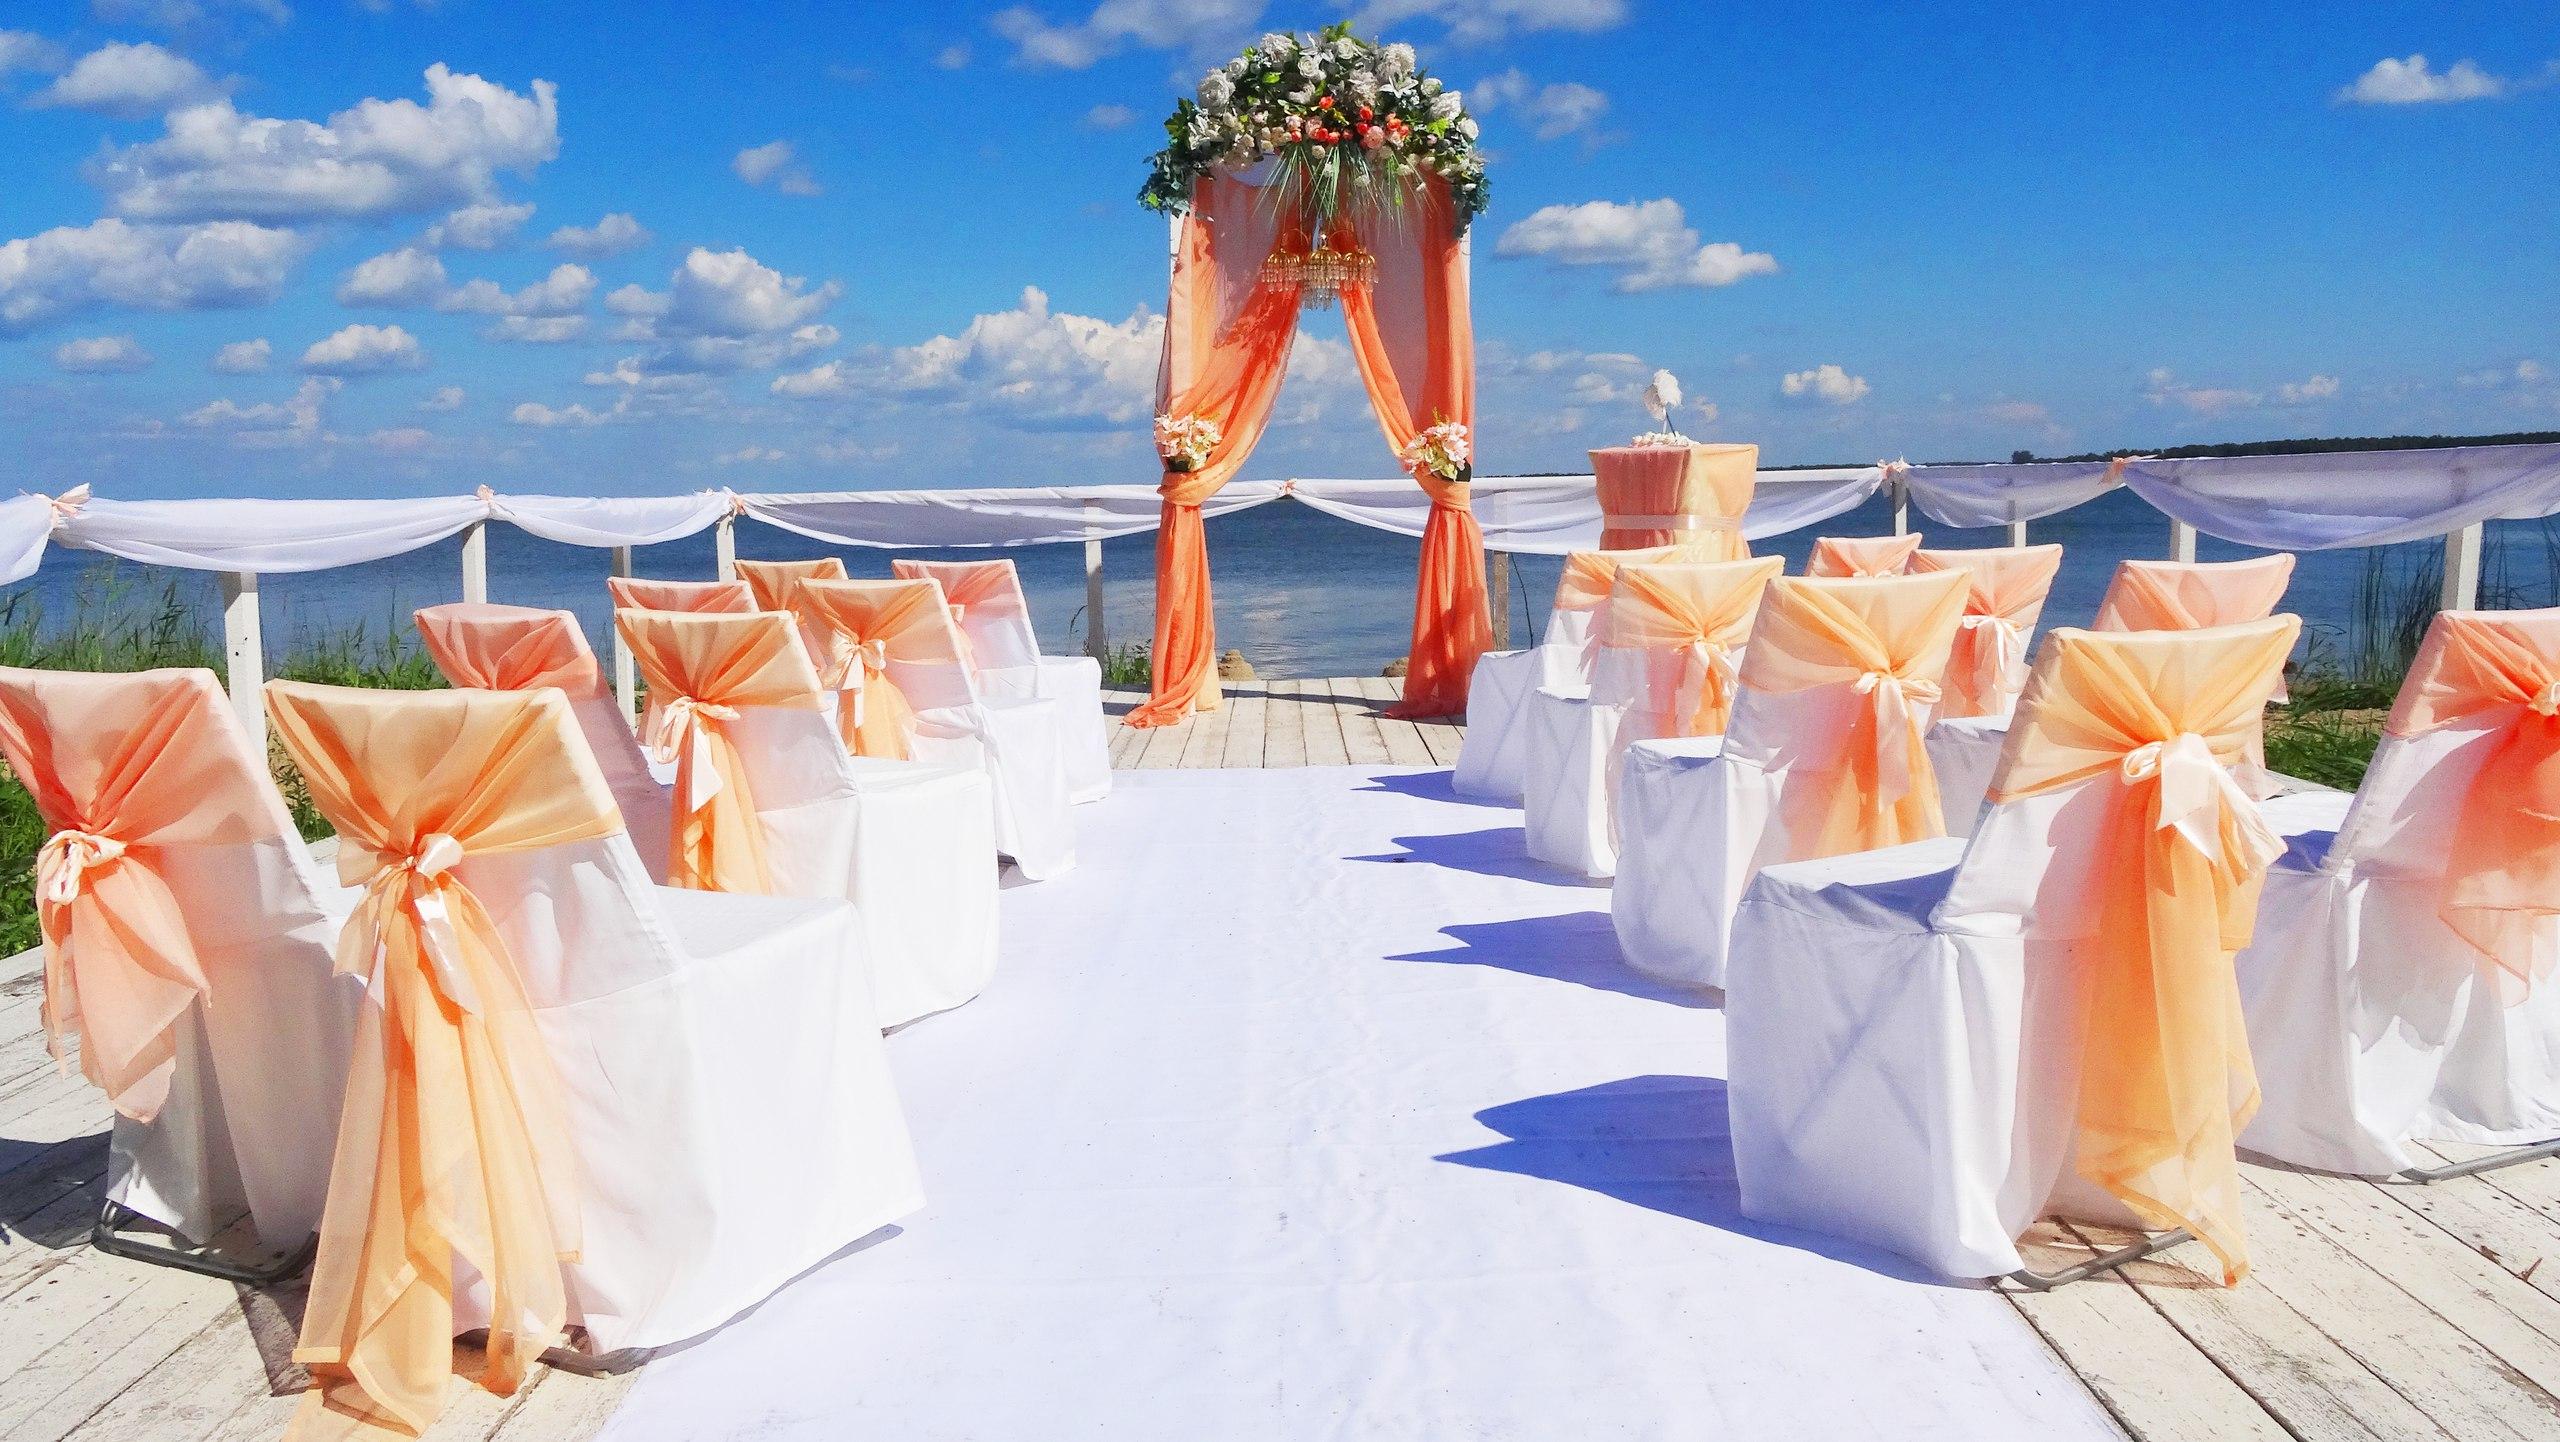 Shartash Wedding в Екатеринбурге